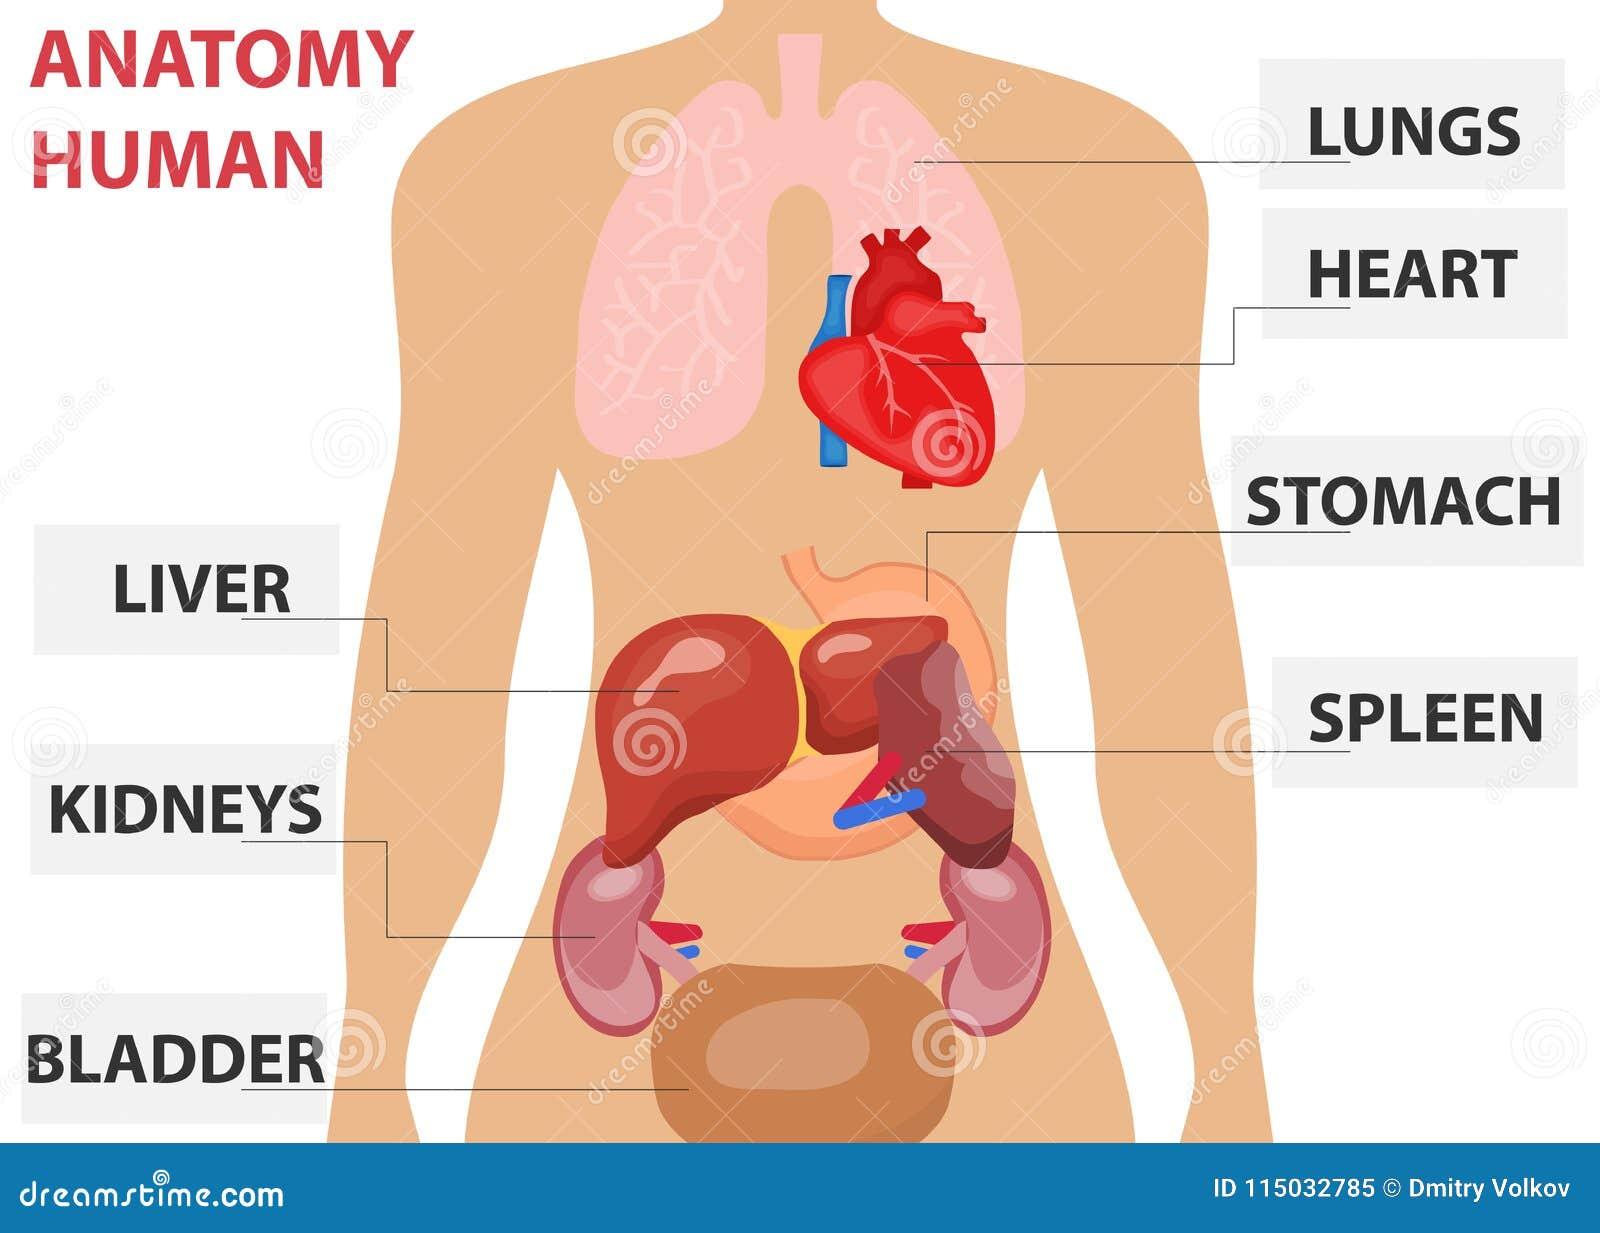 inre organ placering bild